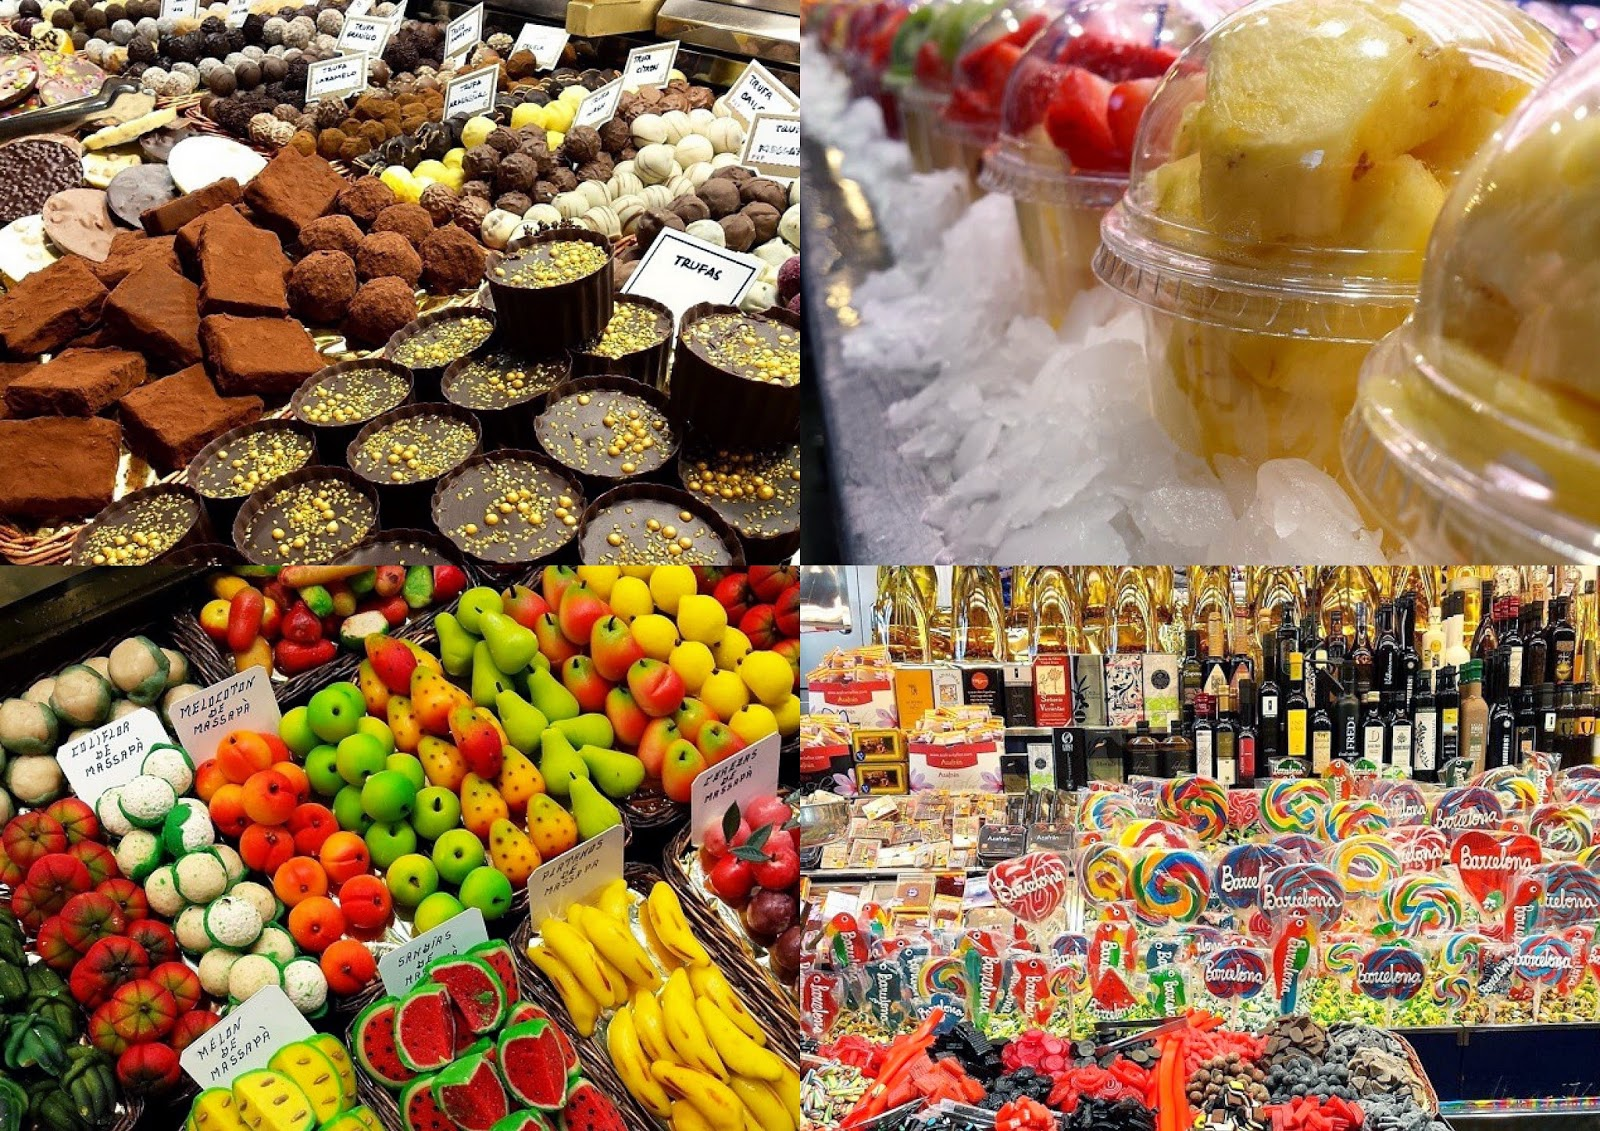 mercado boqueria barcelona frutas chocolates dulces piruletas chucherias magica bcn magica barcelona dulces restaurantes merienda